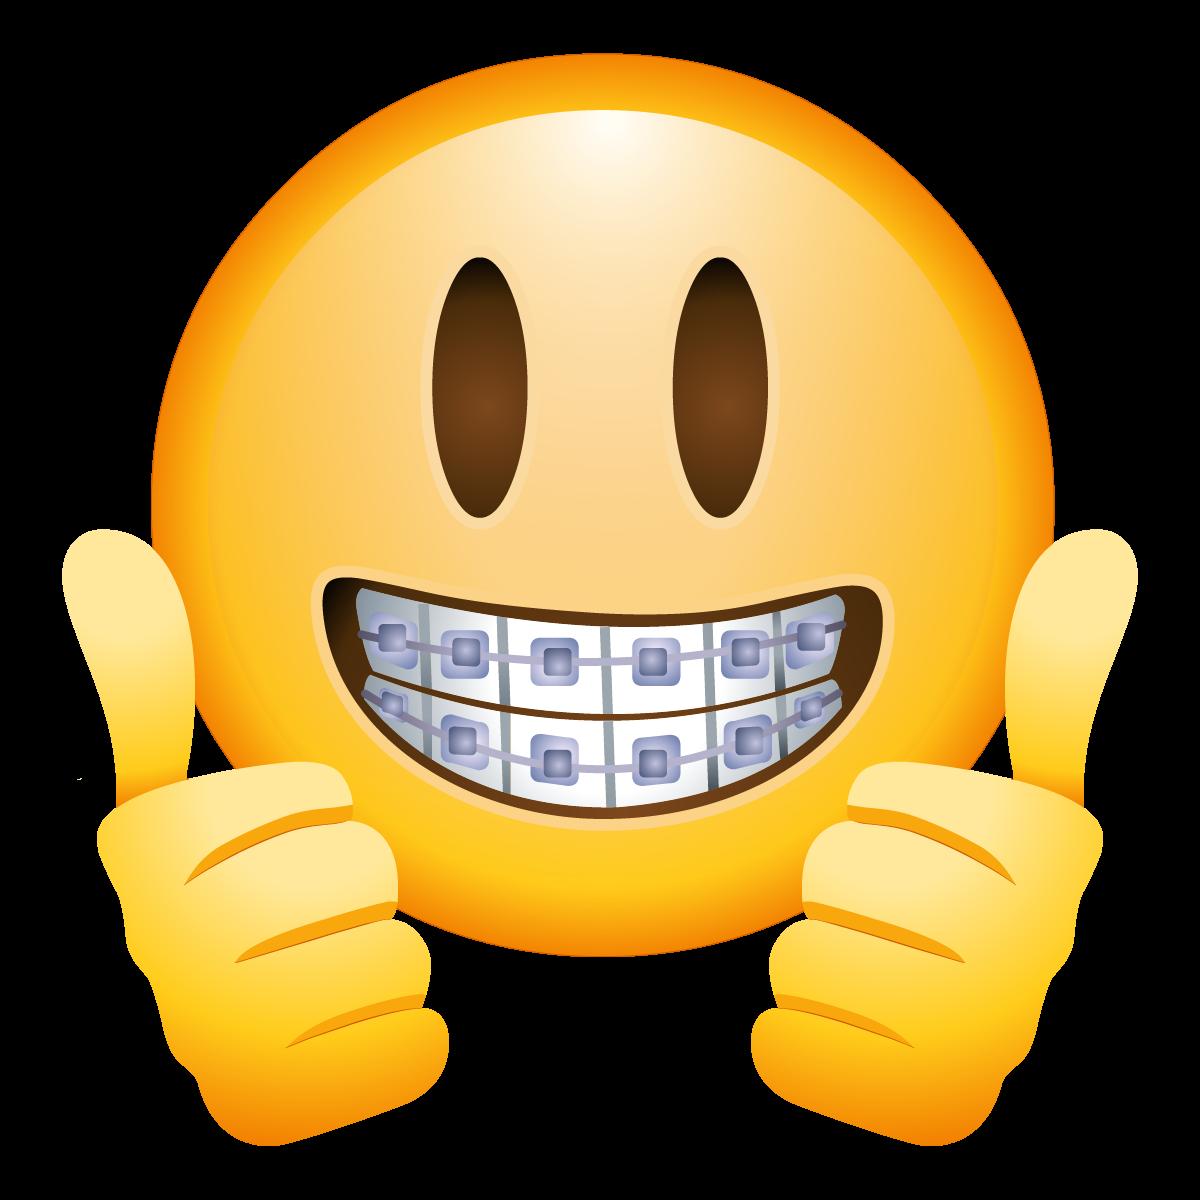 banner transparent stock Braces clipart los. Emoji with emojis pinterest